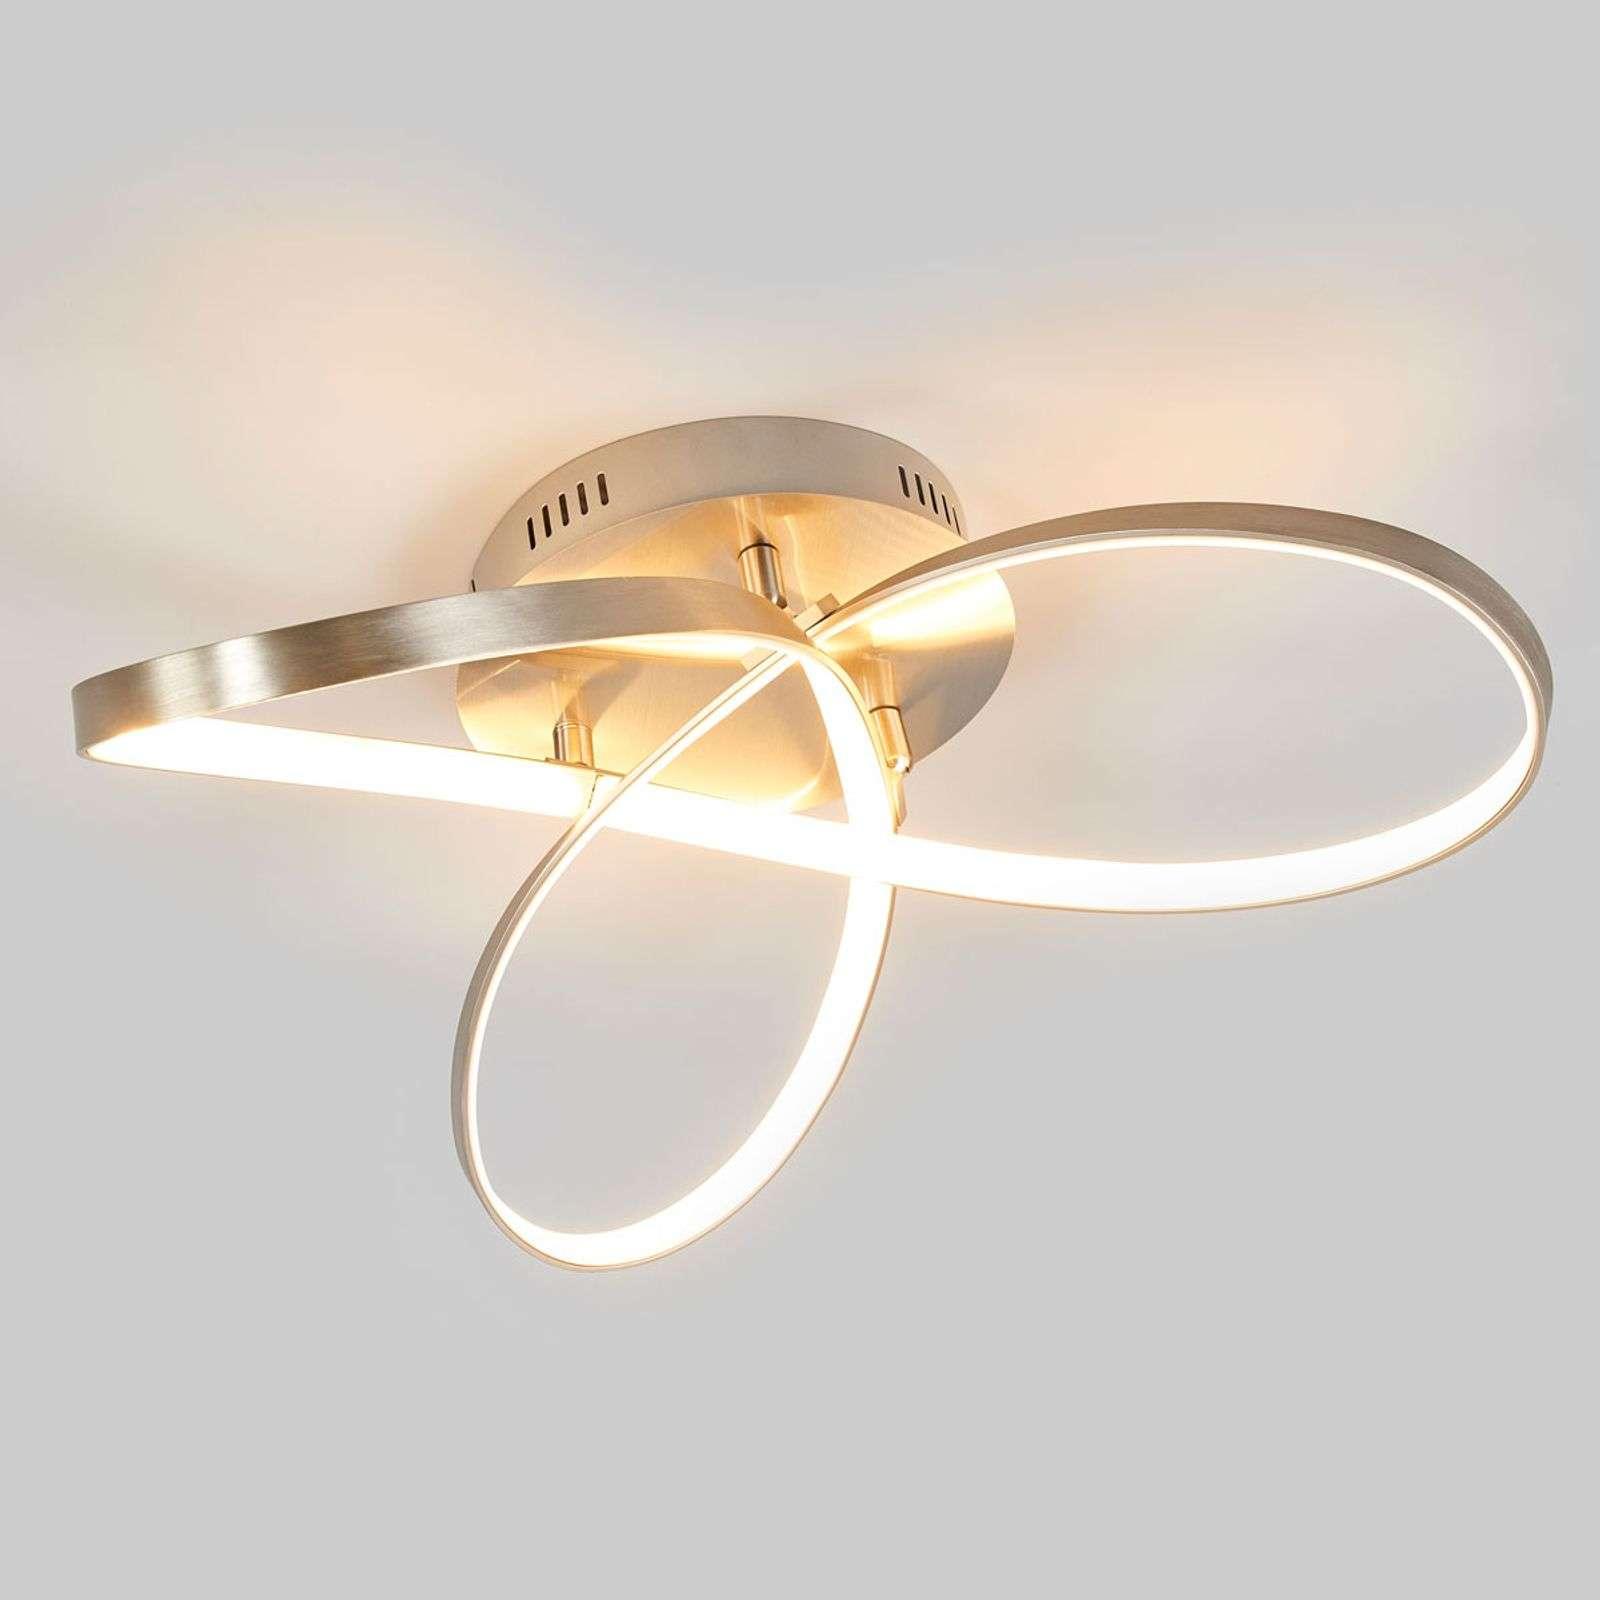 Lampenwelt.com Plafonnier LED Saliha au design moderne - LAMPENWELT.com